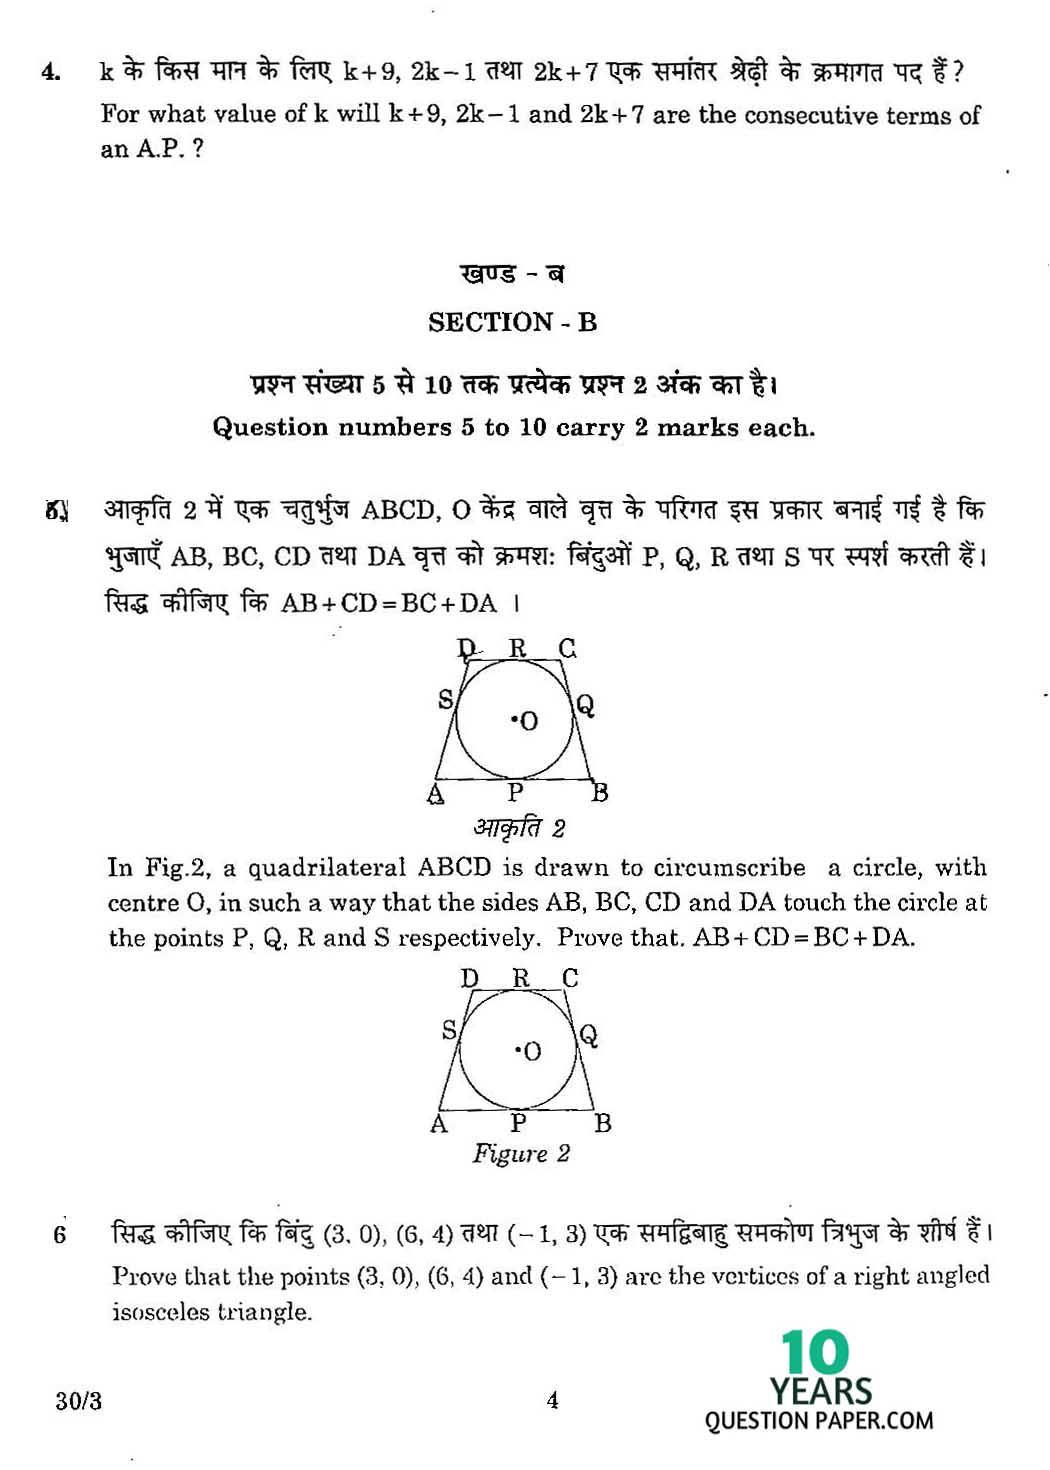 Maths Question Paper For Class 10th Cbse